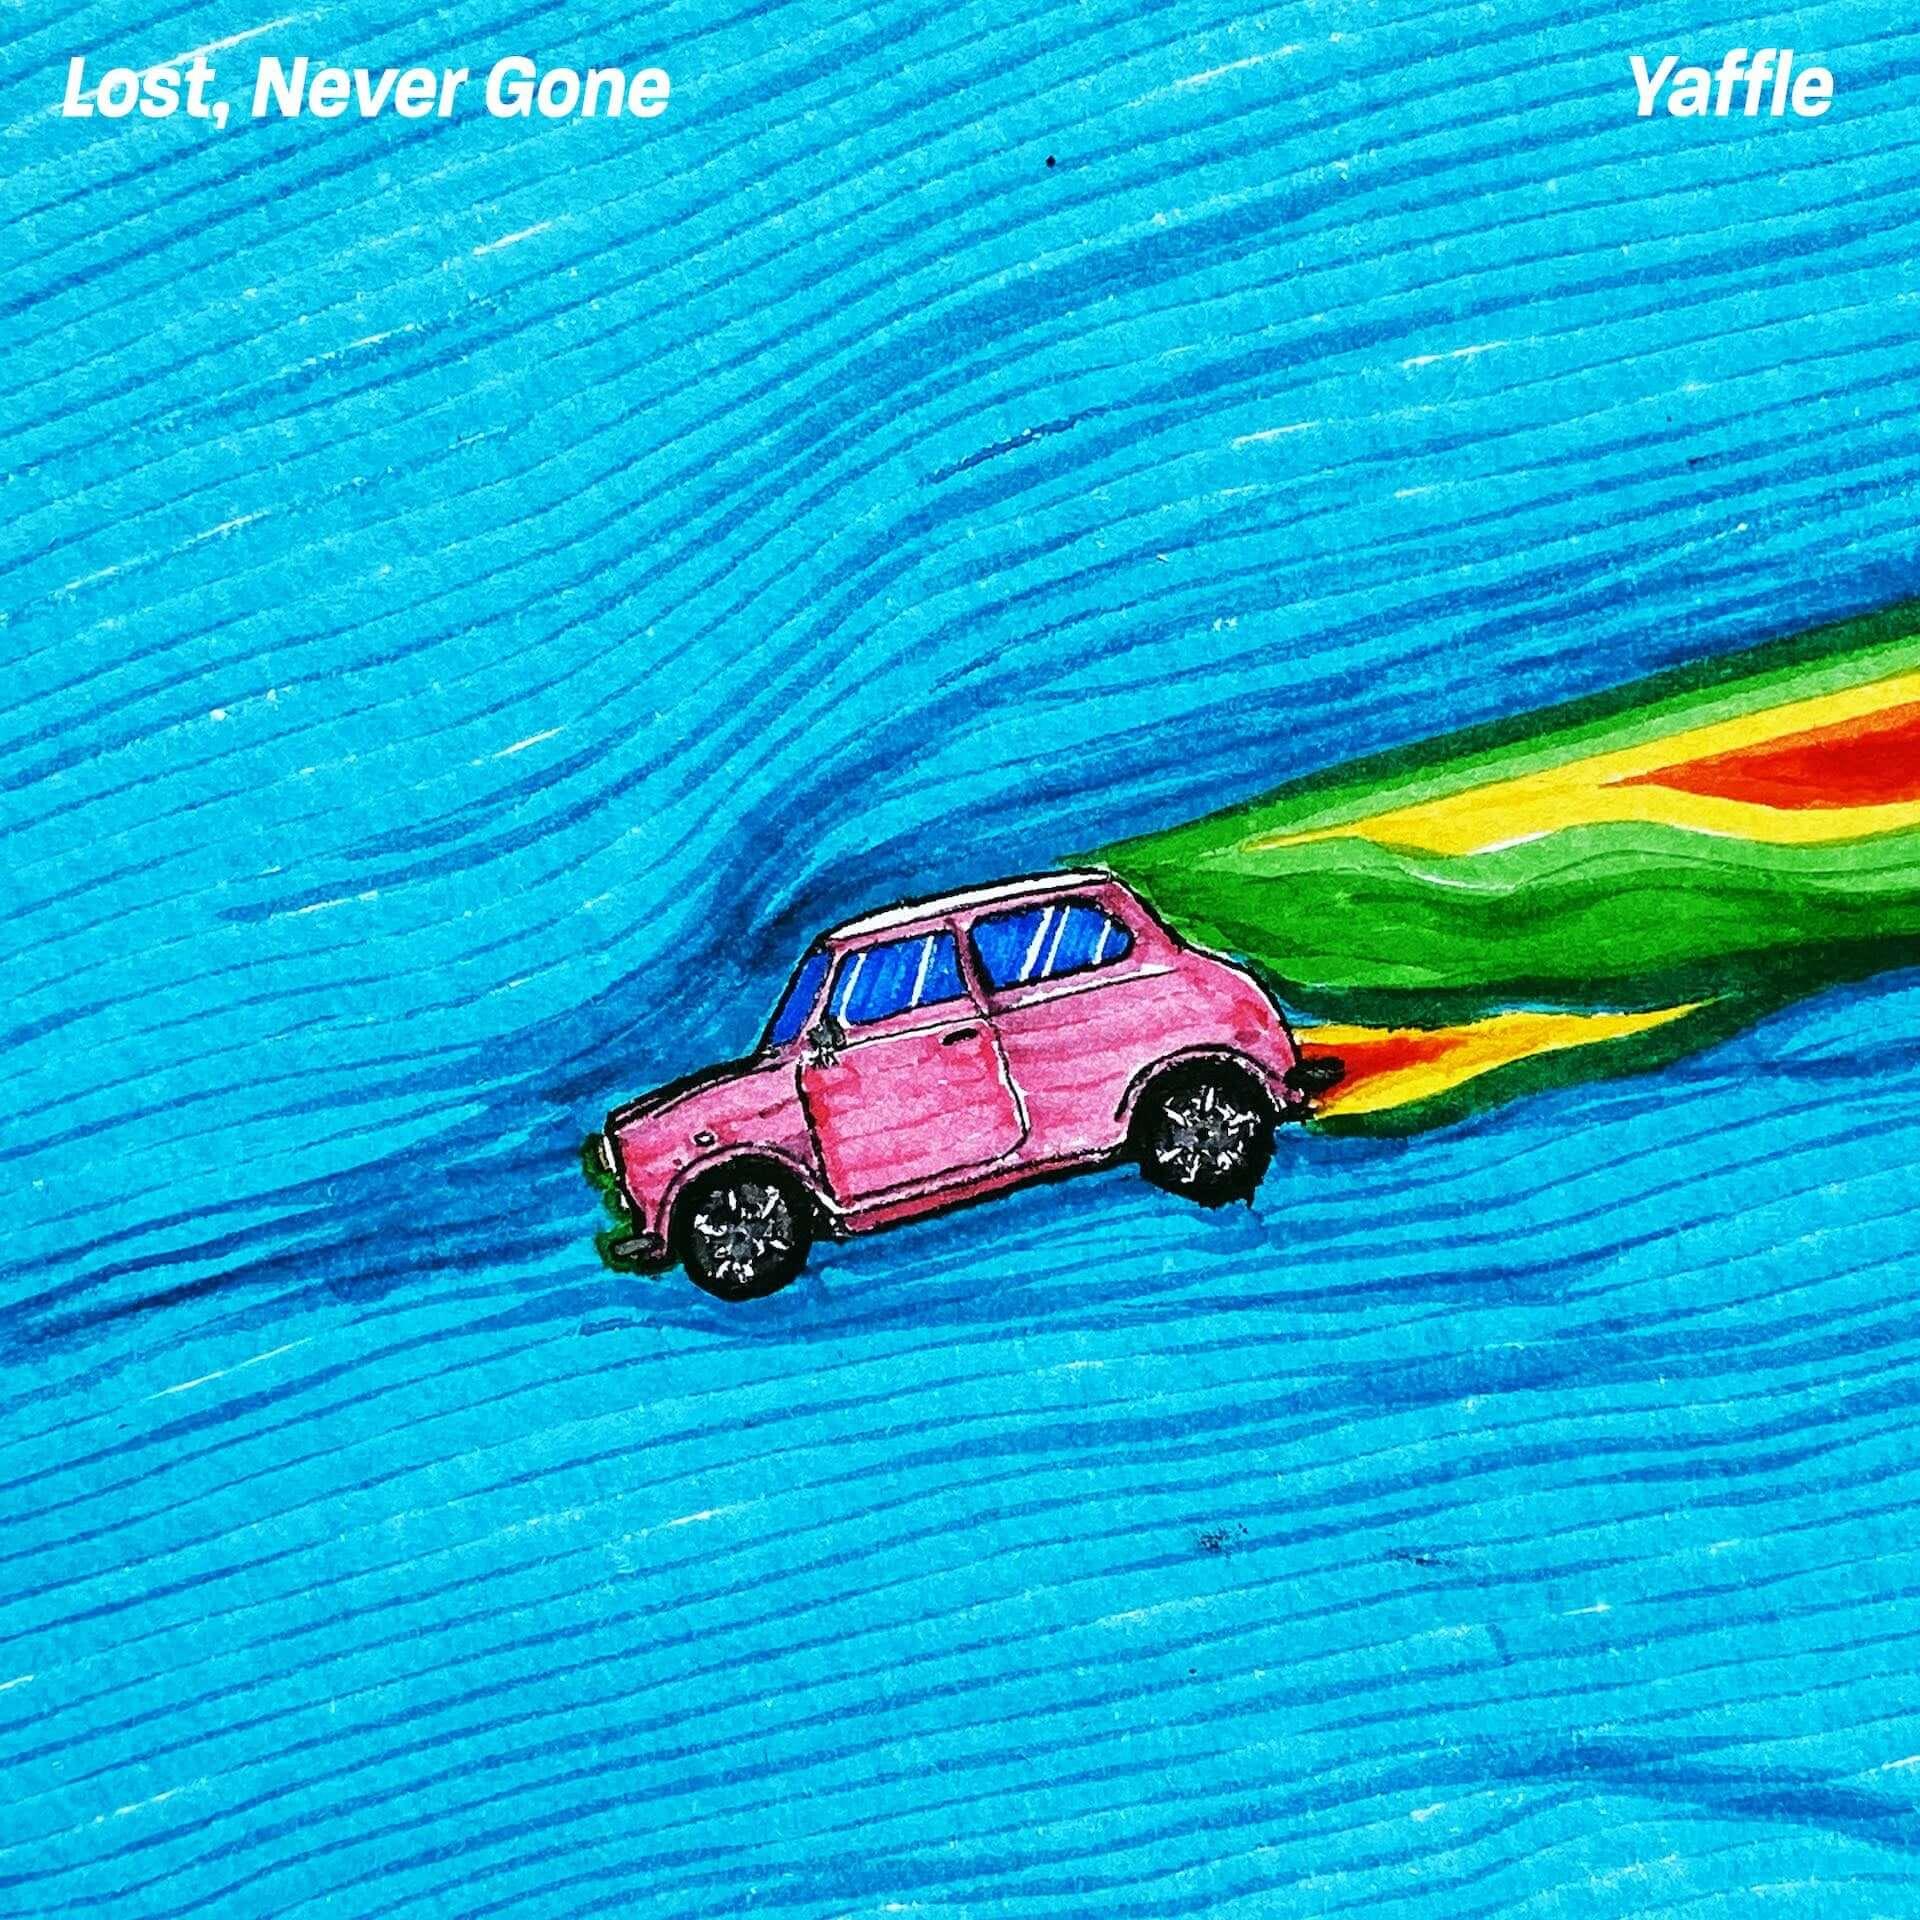 Yaffleが1stアルバム『Lost, Never Gone』とリード曲MVを解禁!高岩遼、iri、SIRUP、OKAMOTO'Sら7組のコメントも到着 music200918_yaffle_2-1920x1920